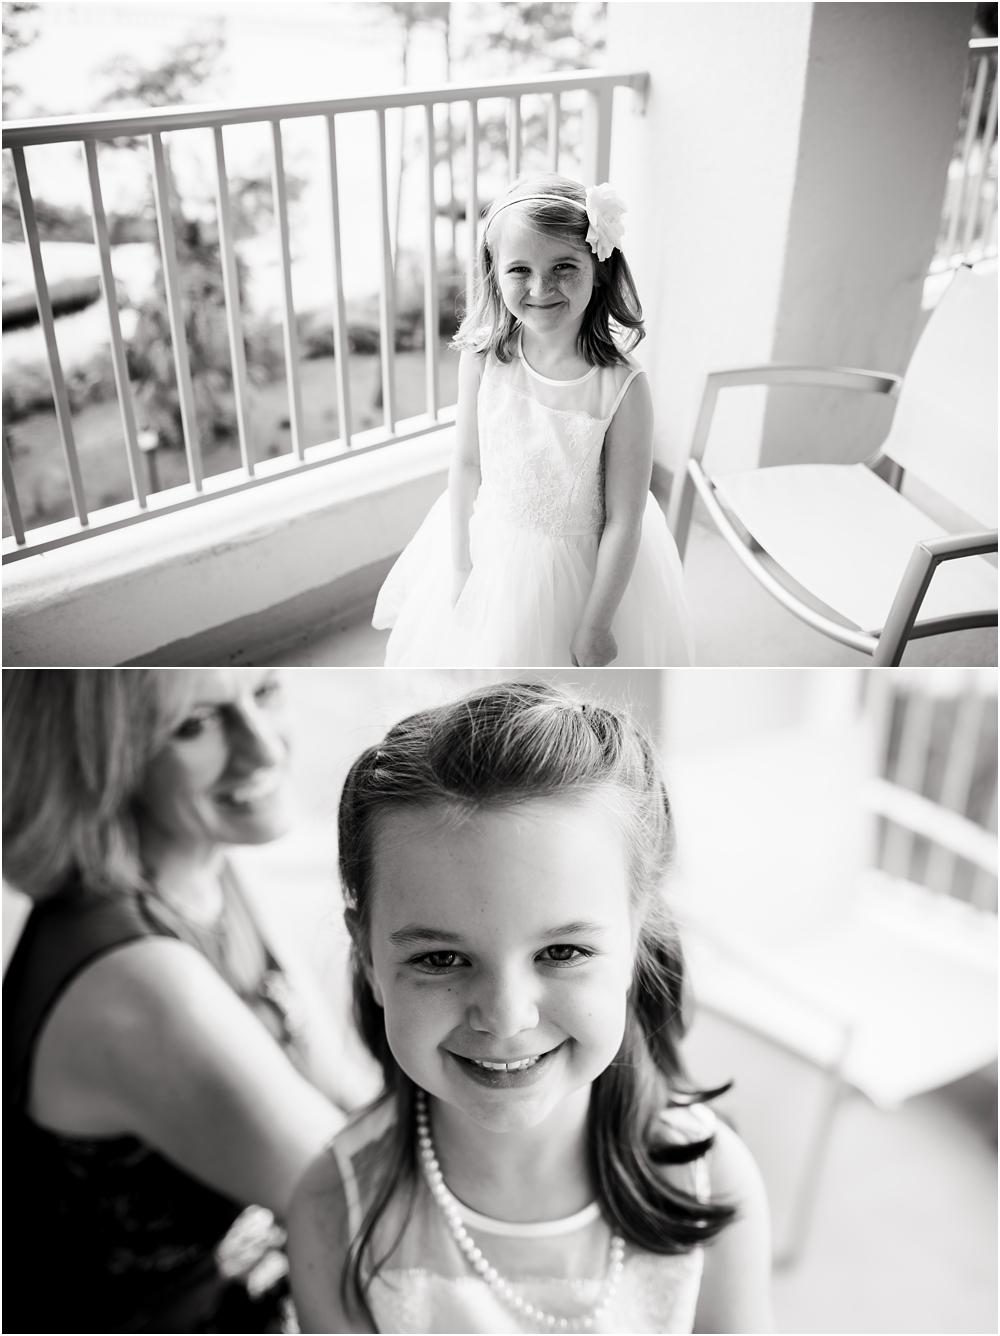 quinn-bay-point-sheraton-florida-wedding-photographer-kiersten-grant-15.jpg